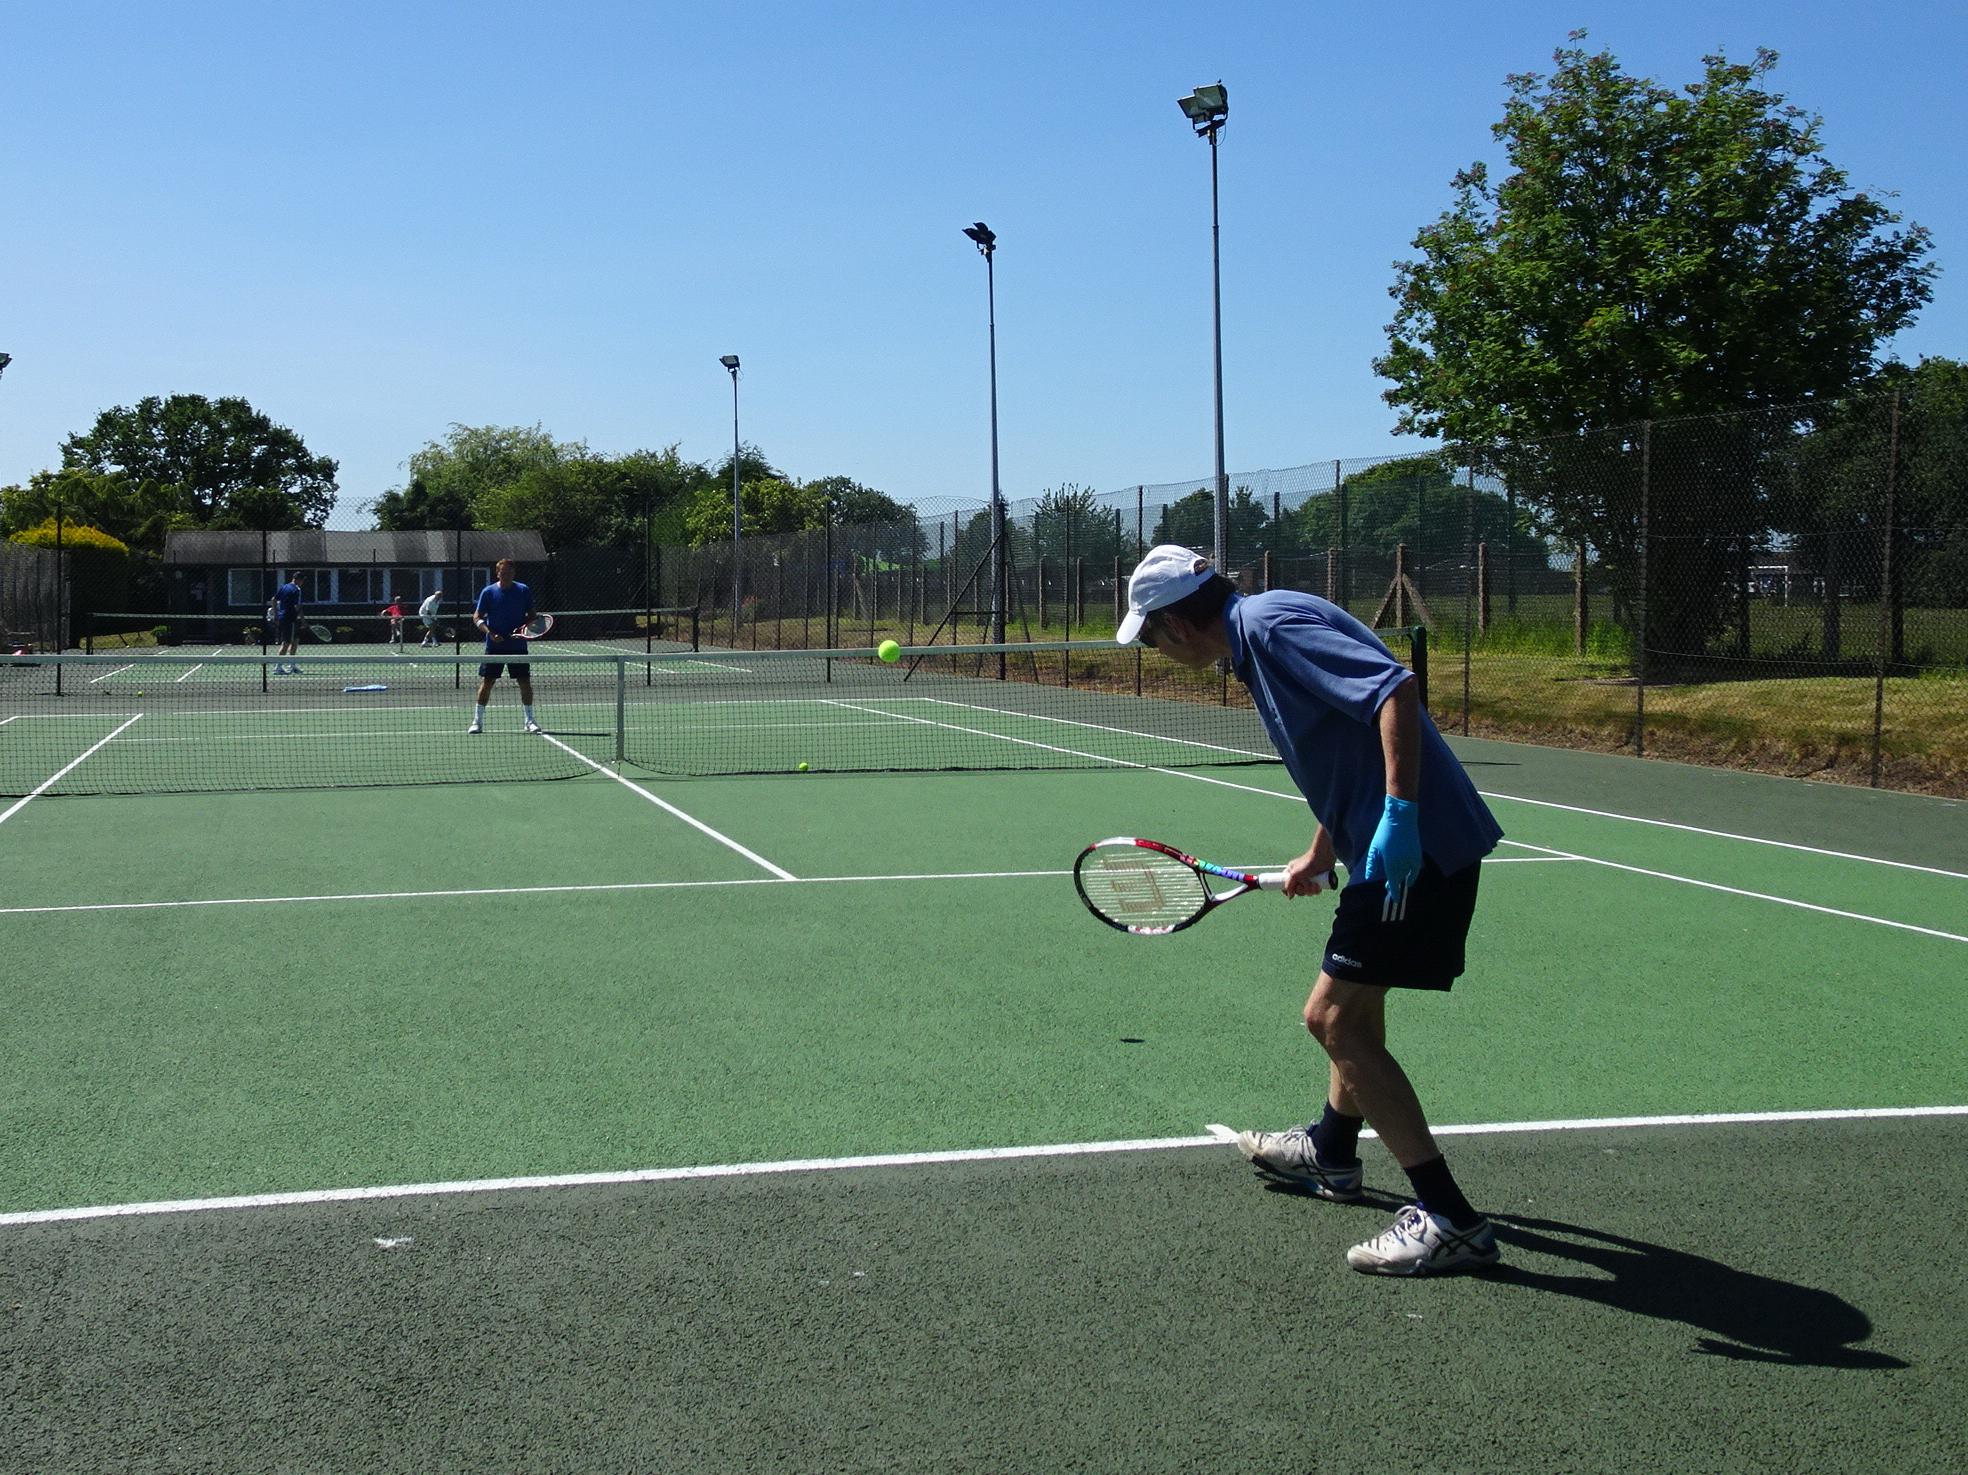 Members back on court at Wistaston Jubilee Tennis Club